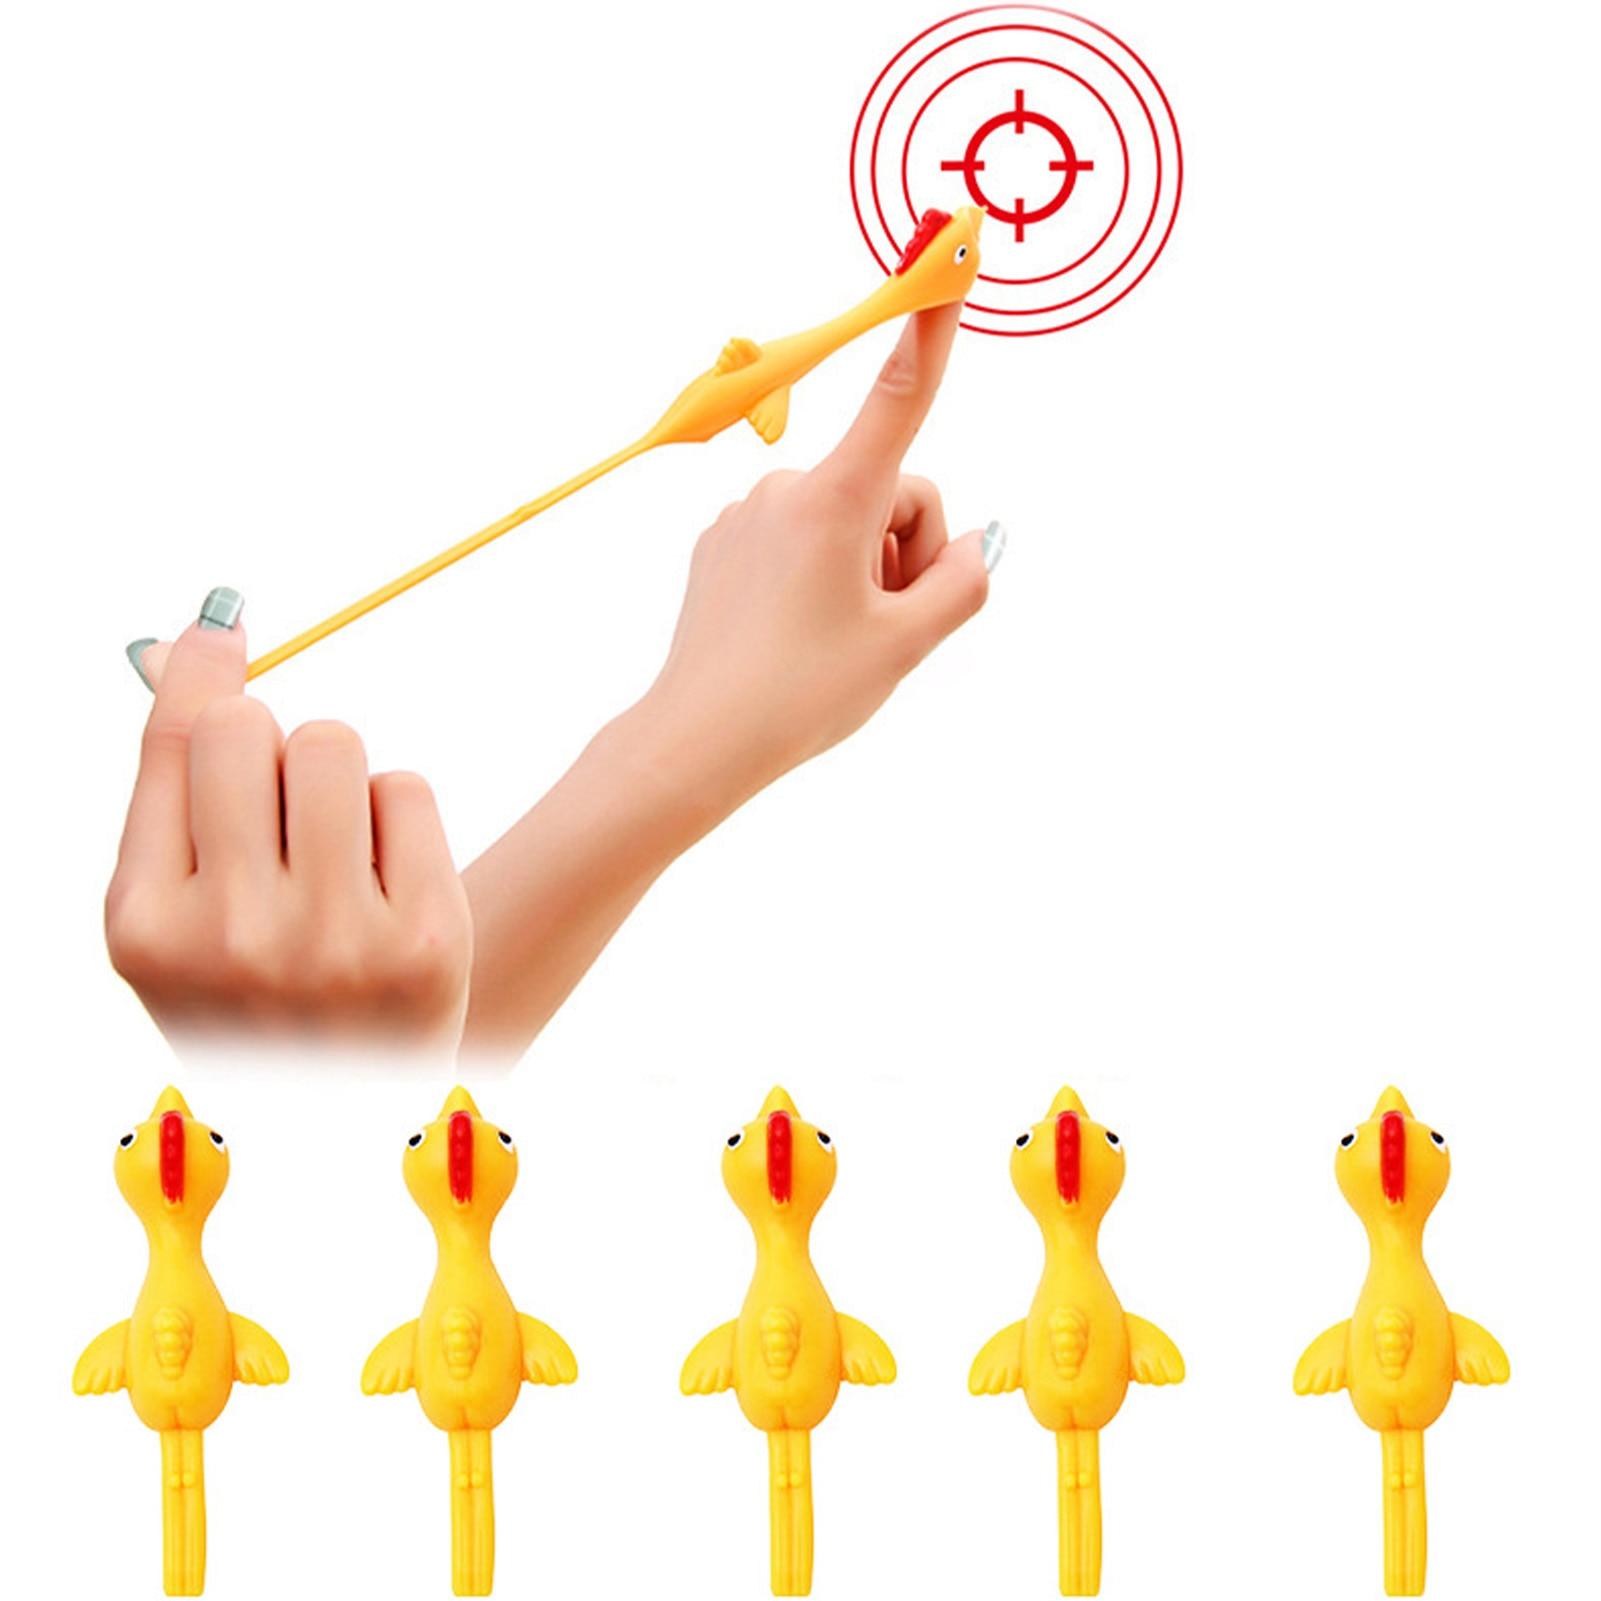 5Pcs Slingshot Chicken Toy Fidget Toys Kids Autism Puzzles Classic Sensory Toy Rubber Flick Flying Chicken Flingers